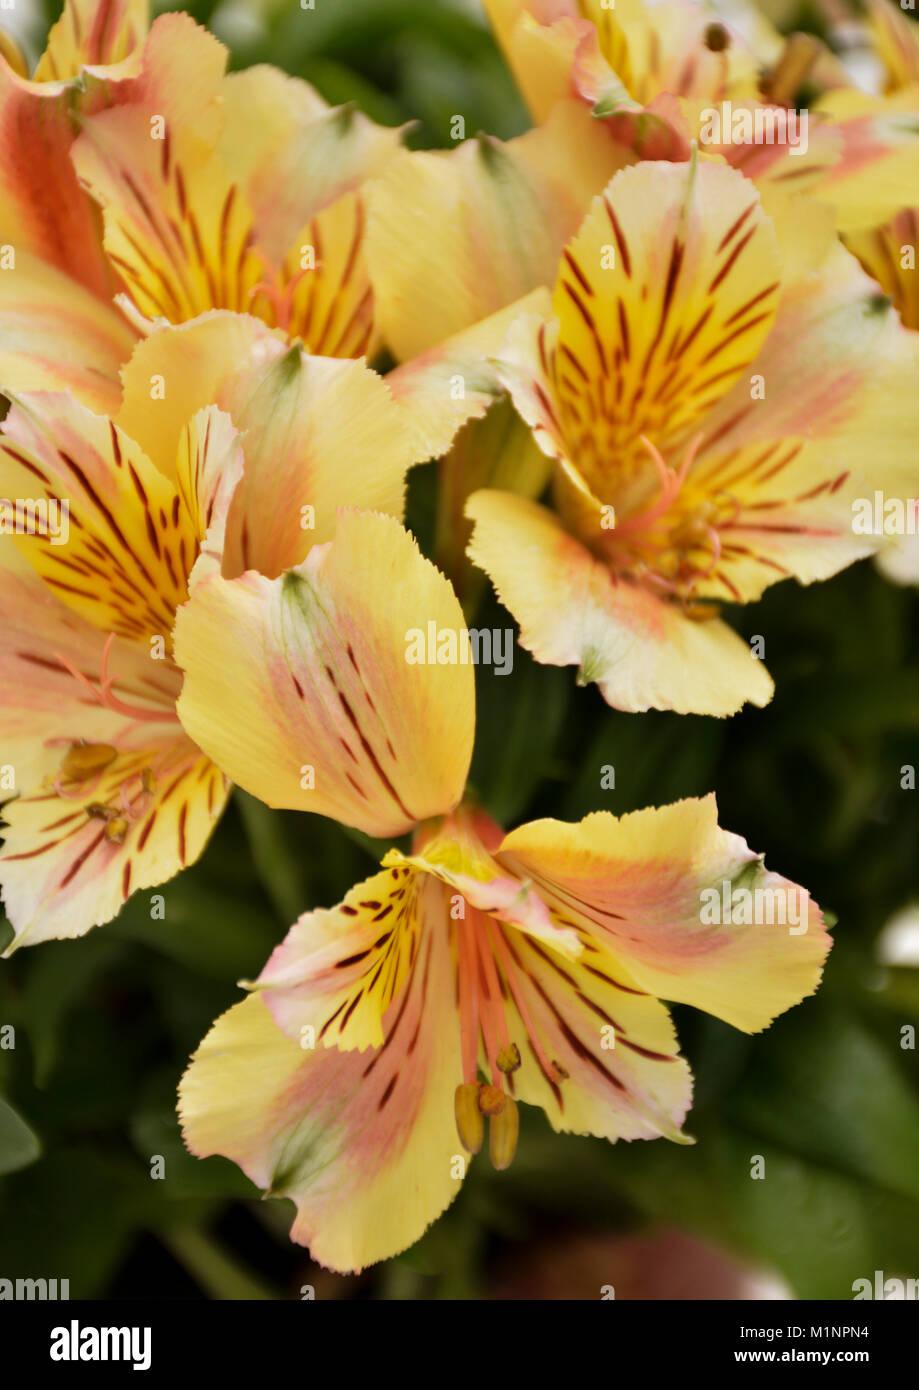 Alstroemeria Princess Lily 8 Stock Photo 173197168 Alamy